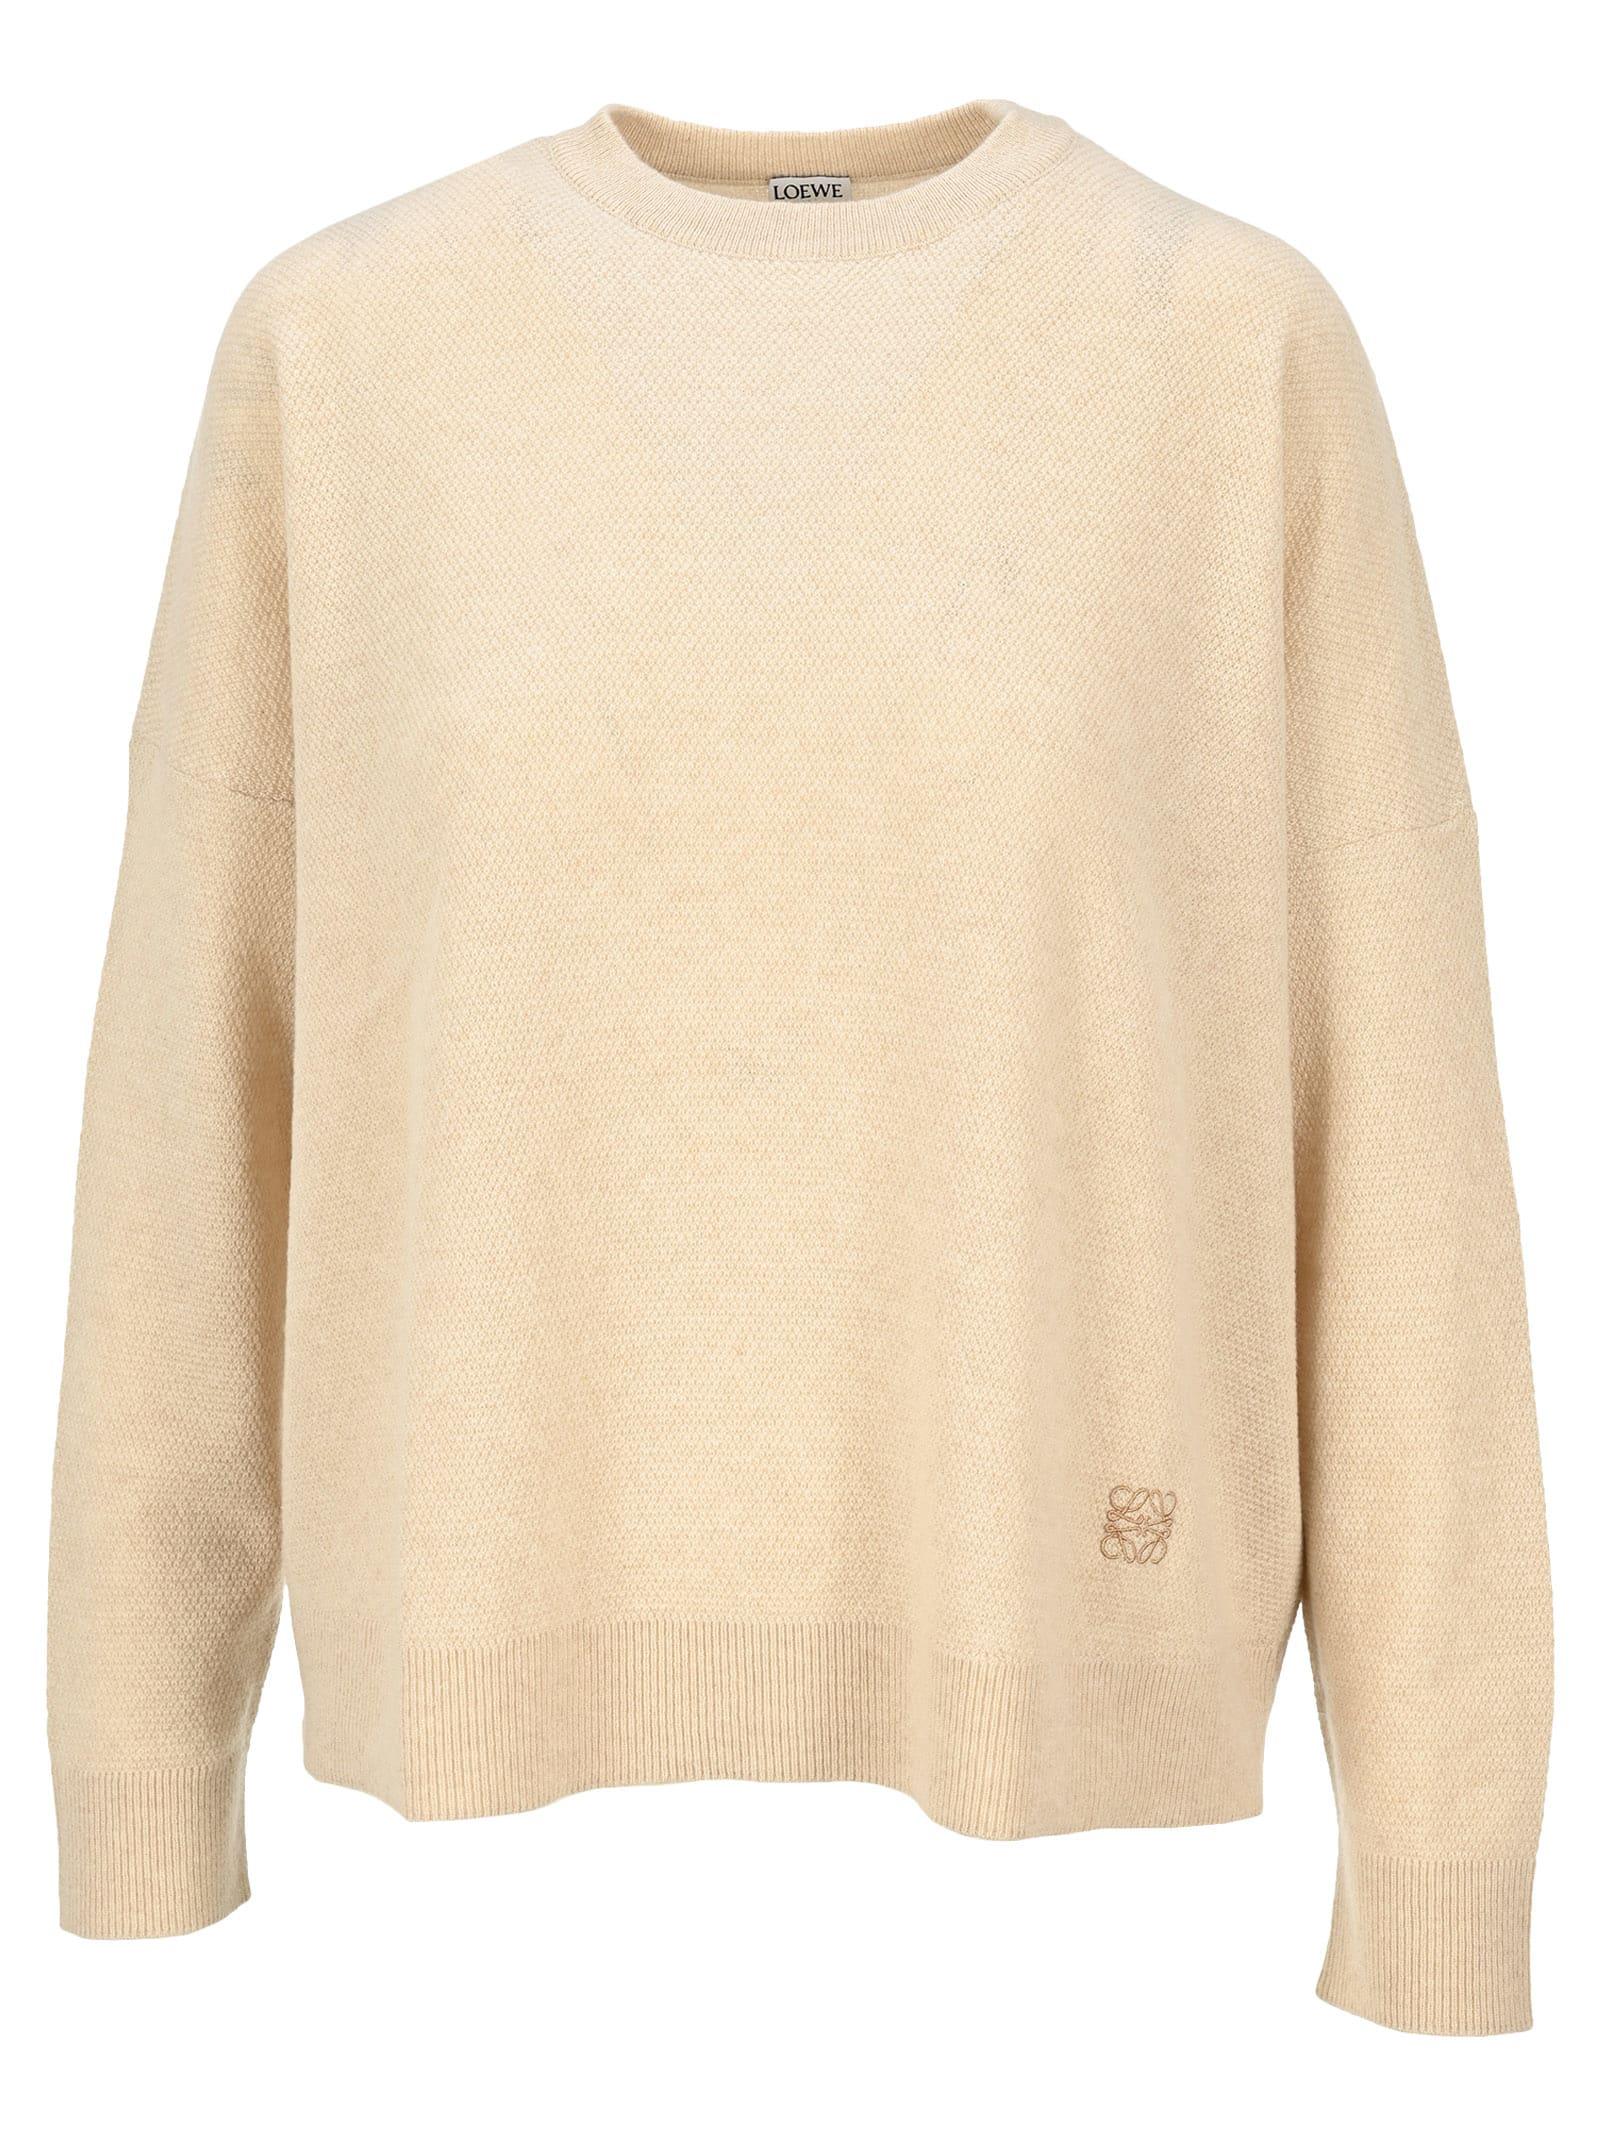 Loewe Sweaters OVERSIZE SWEATER IN CASHMERE